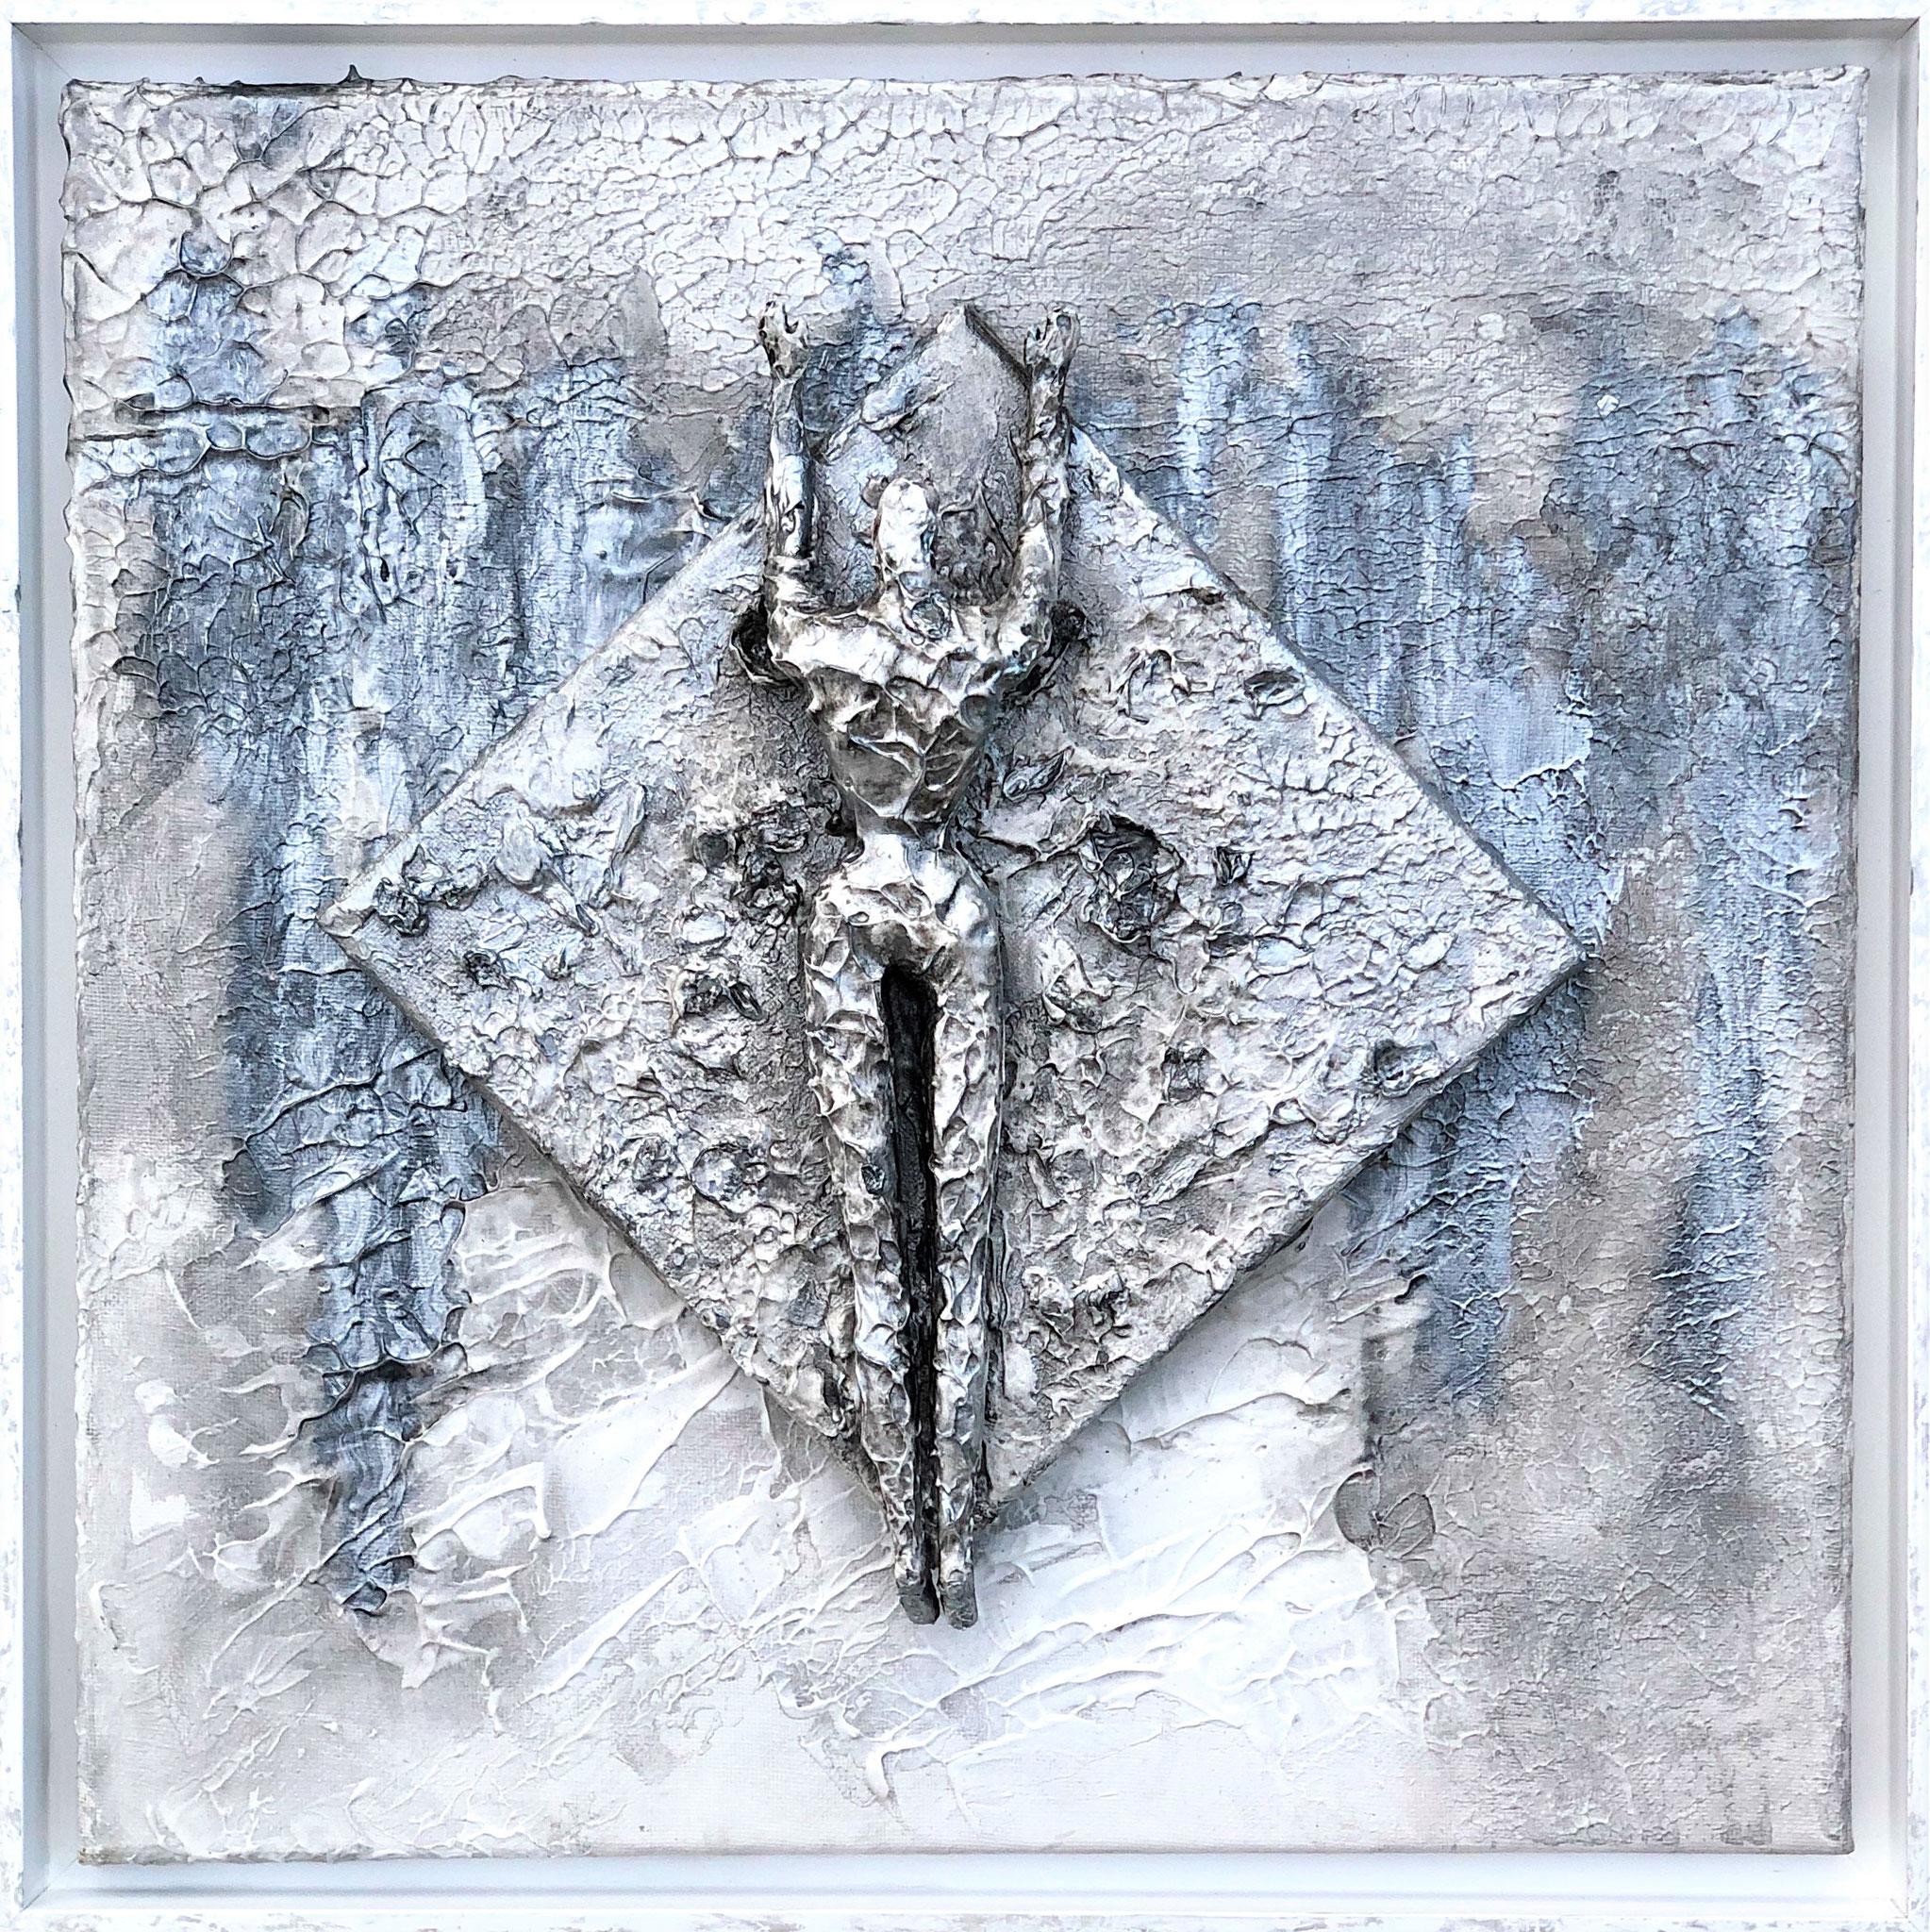 Silver Girl. Homage to James Bond (43x43x8 cm)